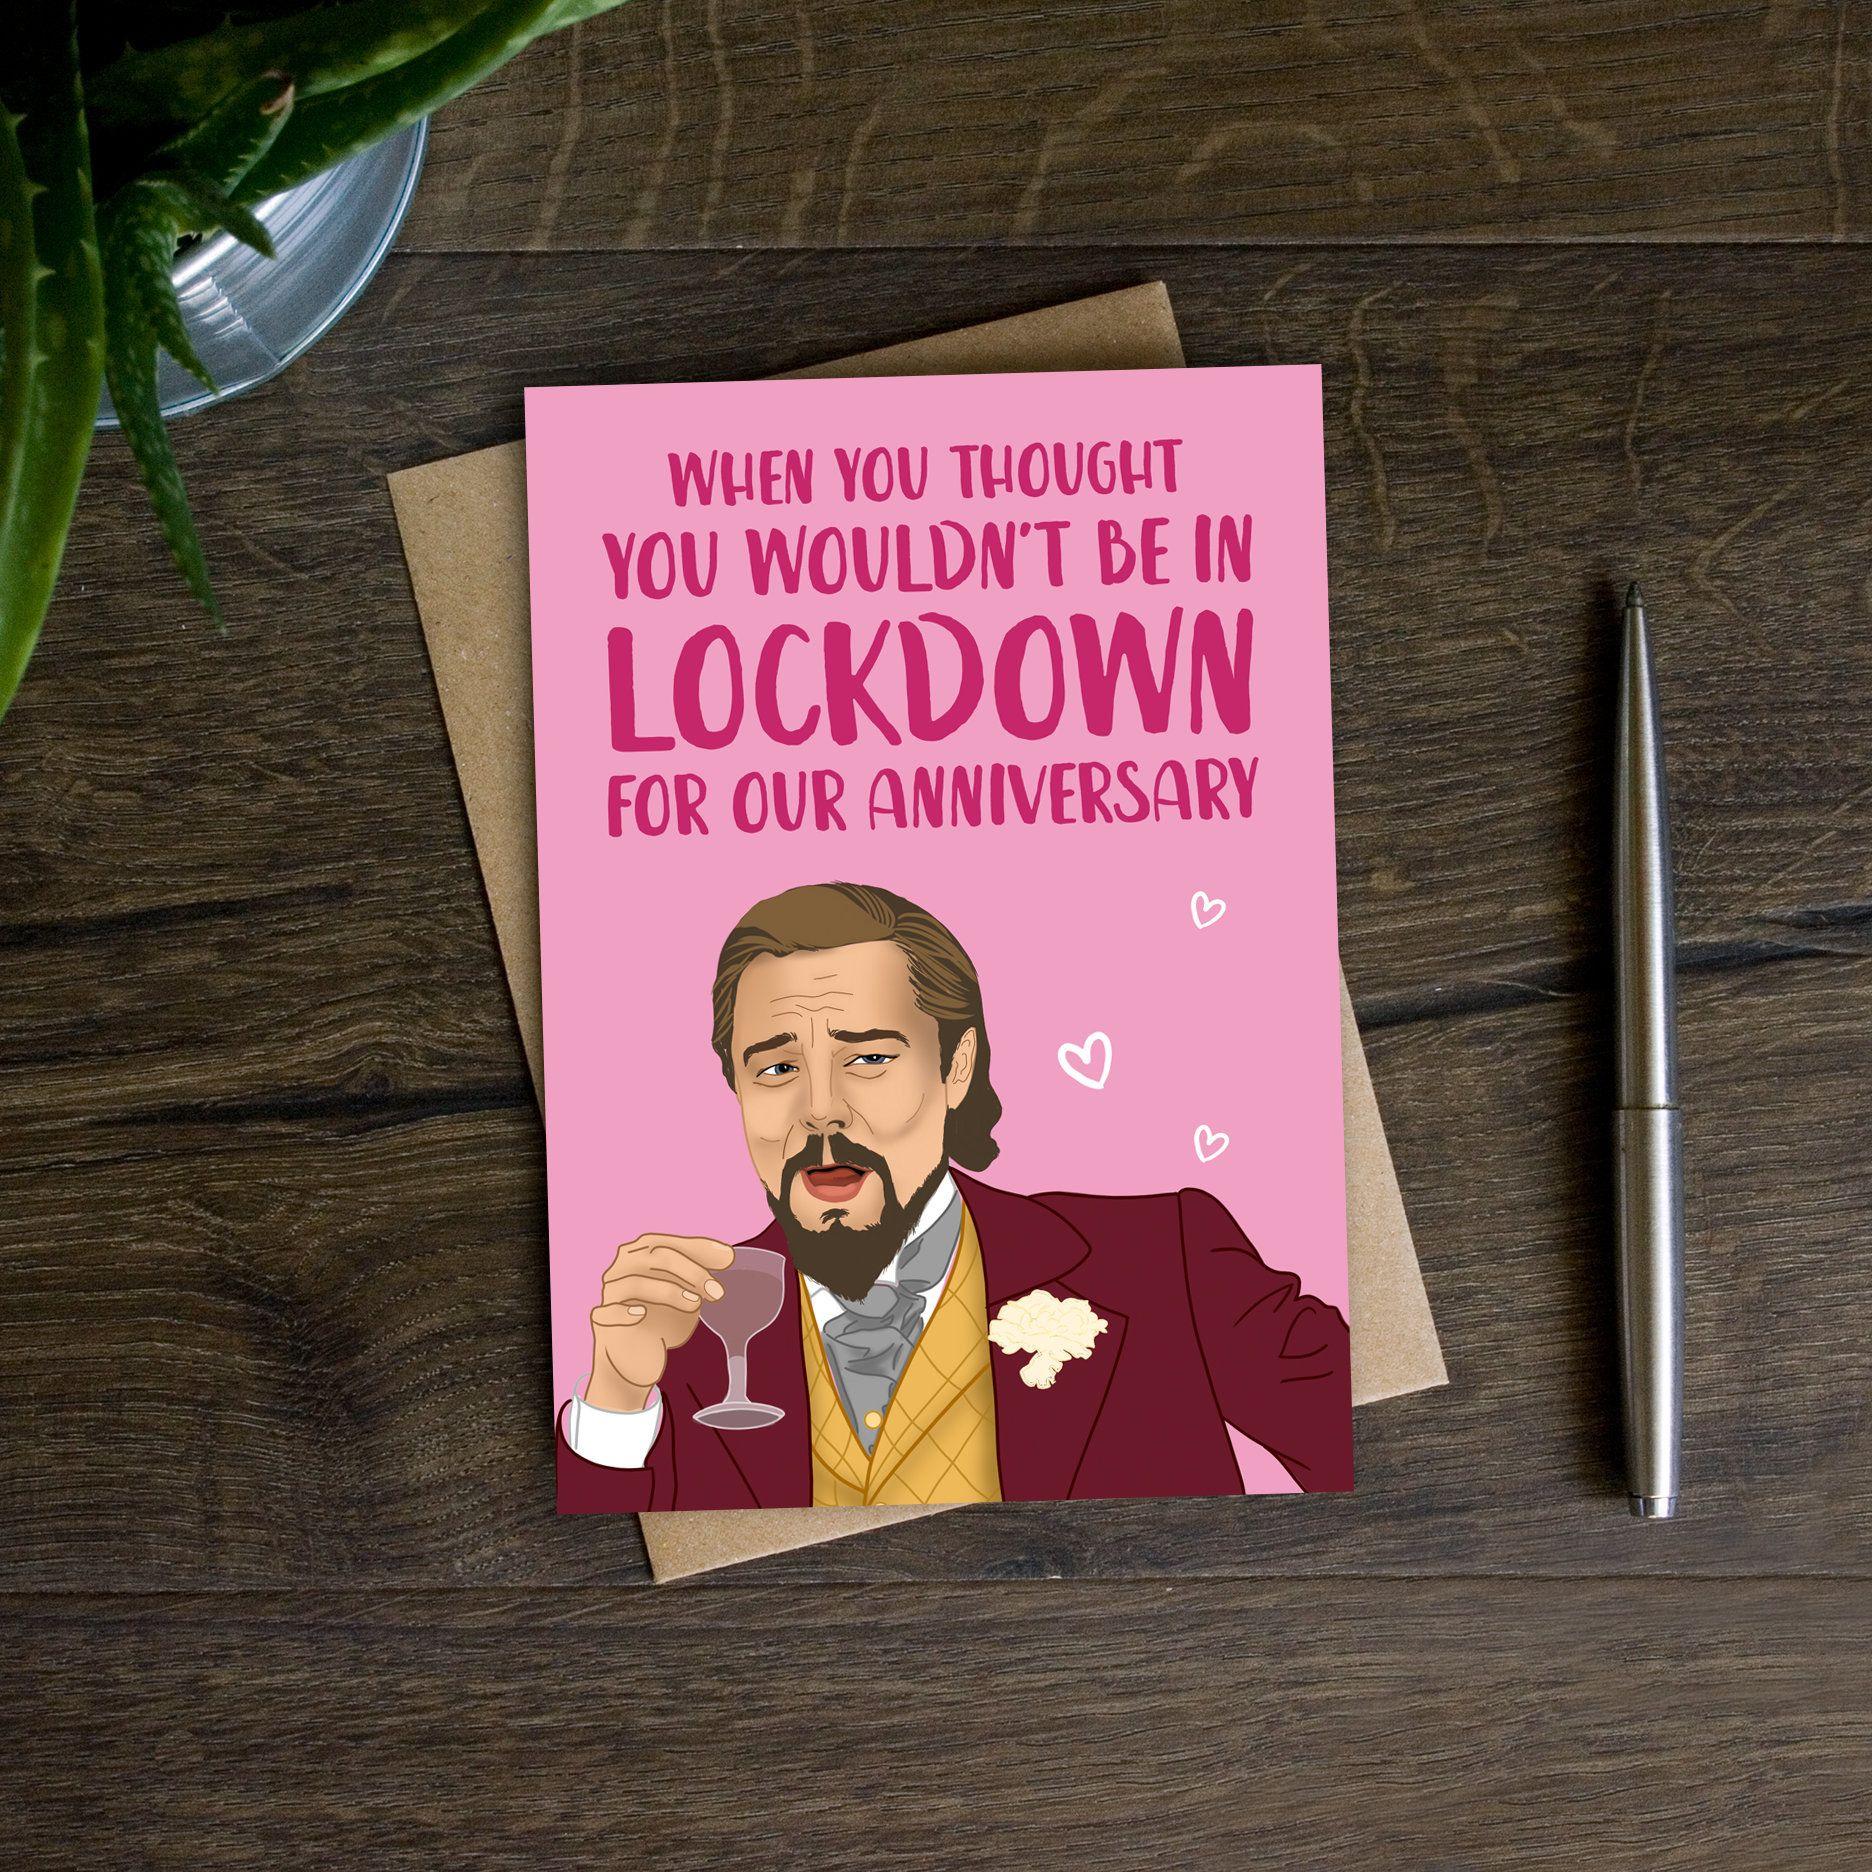 Funny Anniversary Card Django Unchained Meme Lockdown Etsy Funny Anniversary Cards Anniversary Funny Anniversary Cards